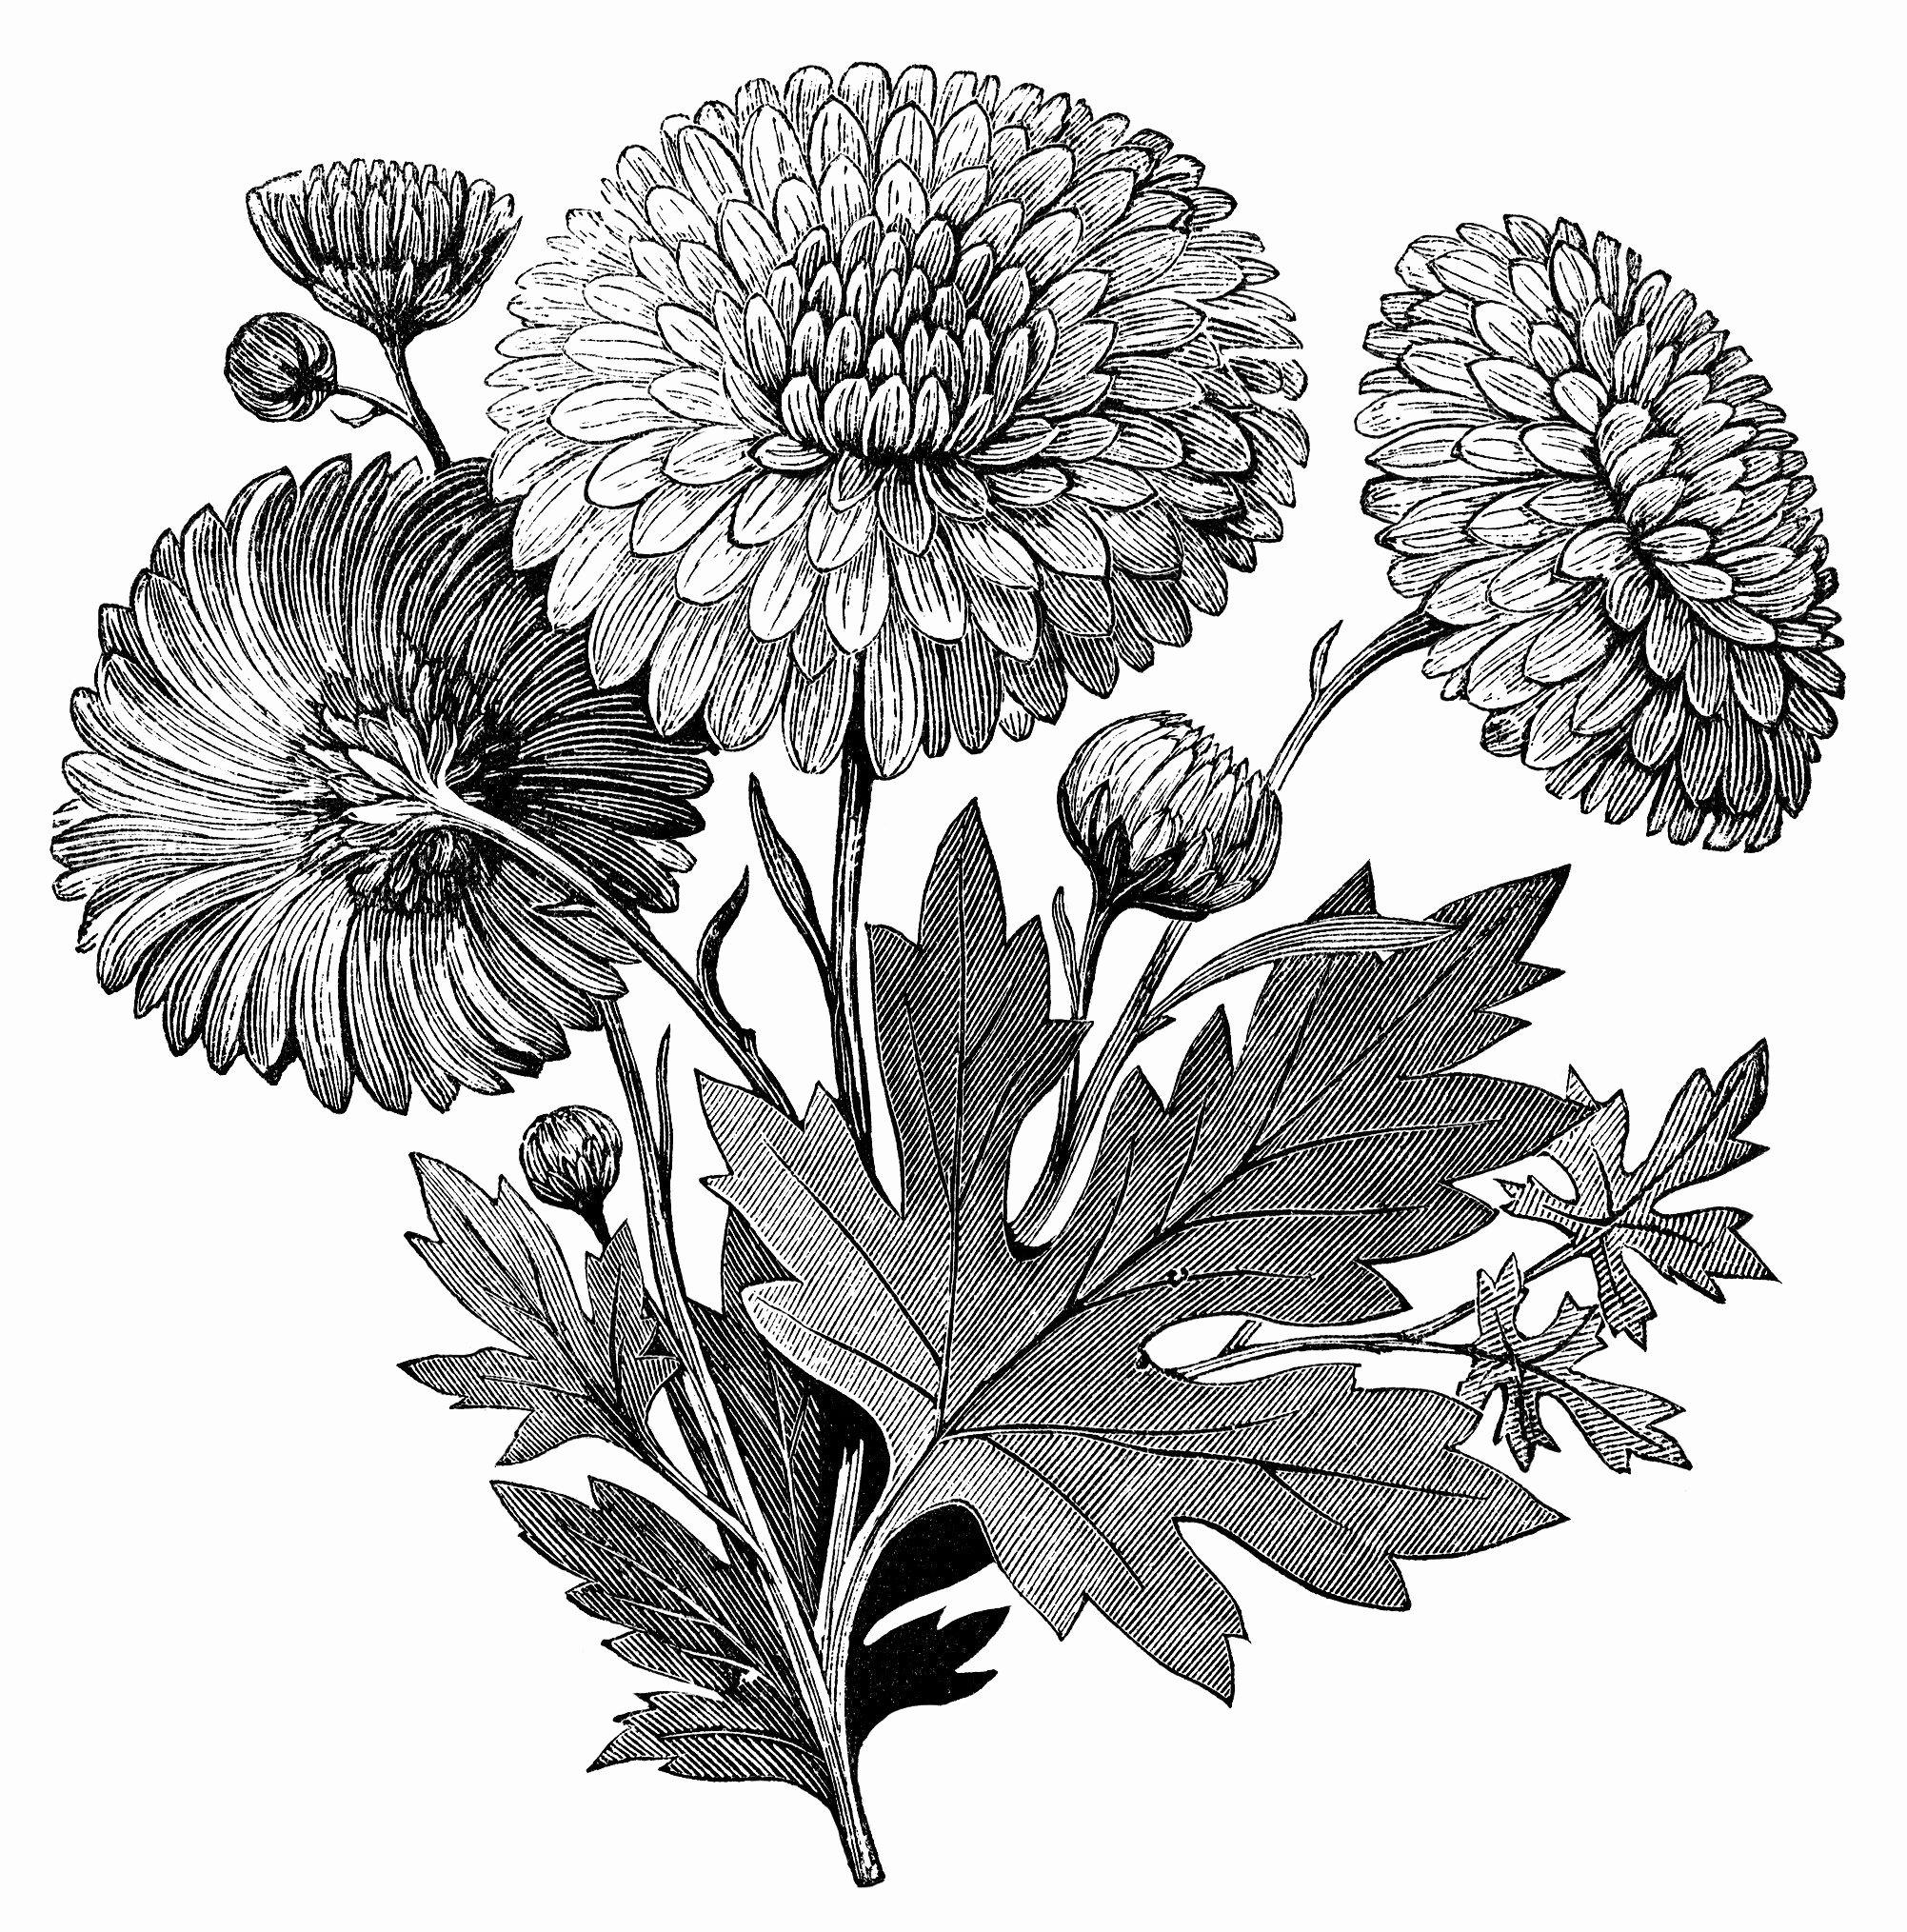 Black and White Flower Drawings Luxury Vintage Flower Clipart Early Flowering Chrysanthemum Chrysanthemum Illustration Black and